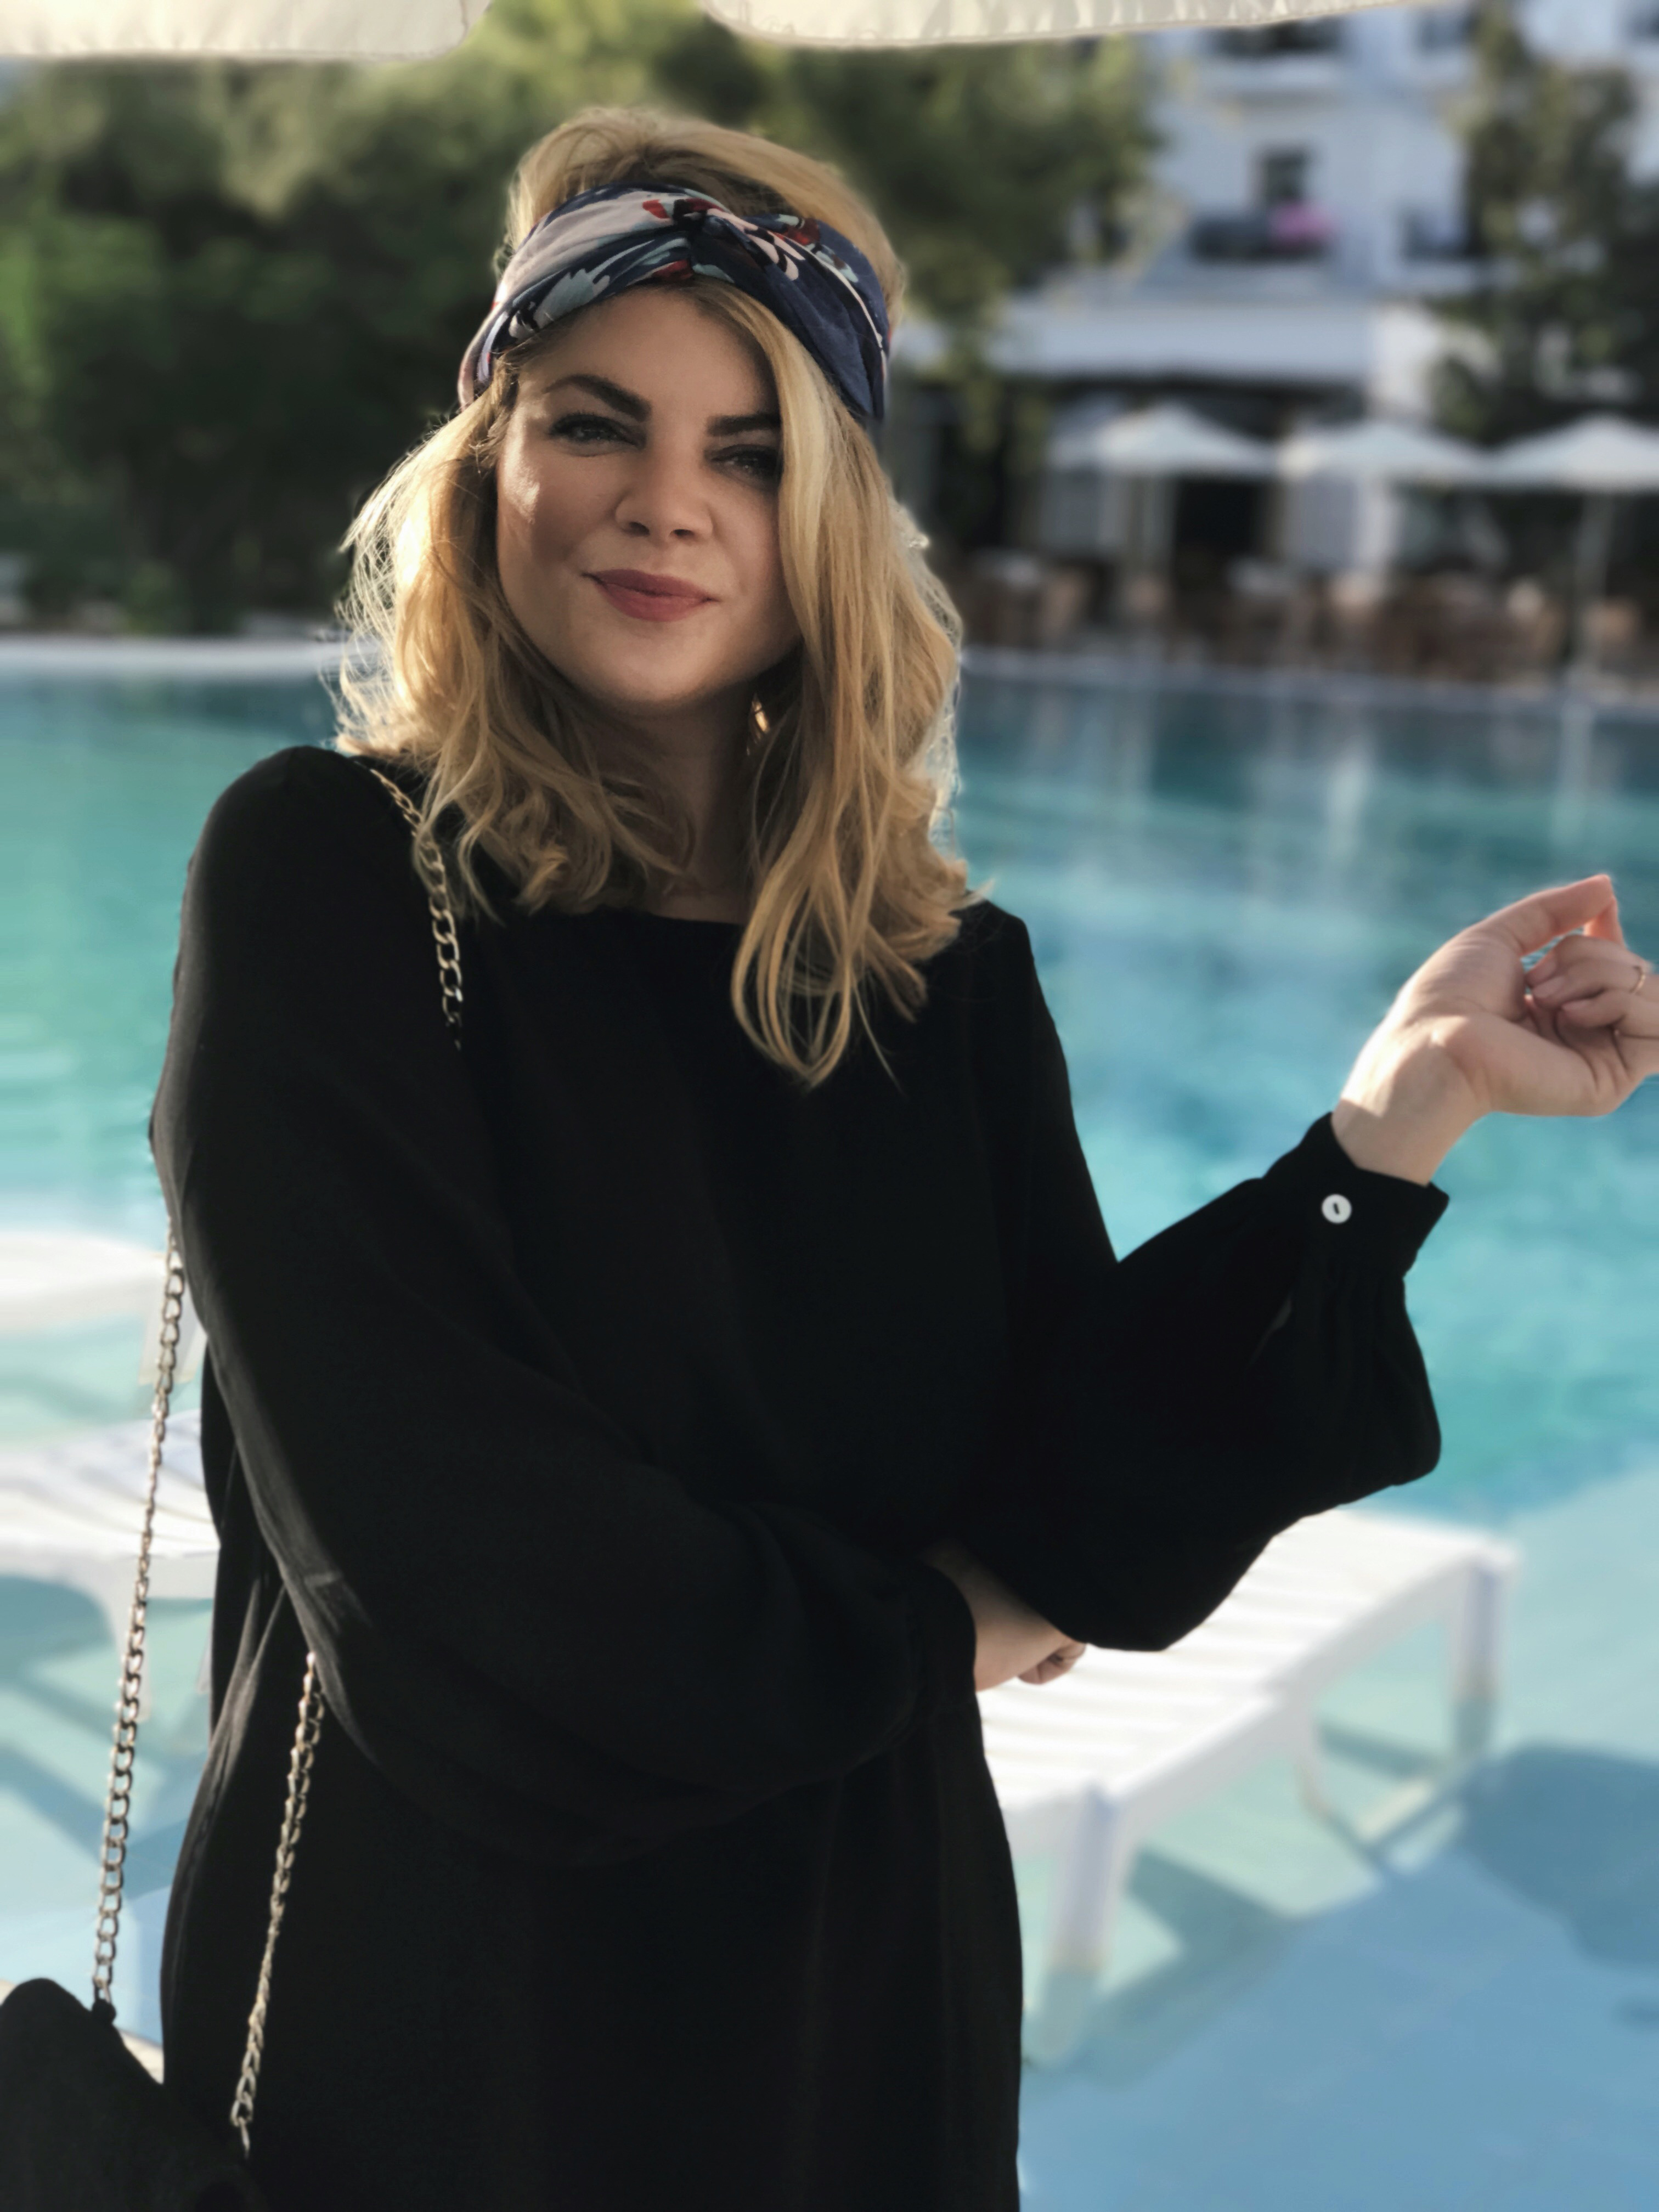 Heidi Klum Lidl Kollektion Friederike hintze Frieda Hintze